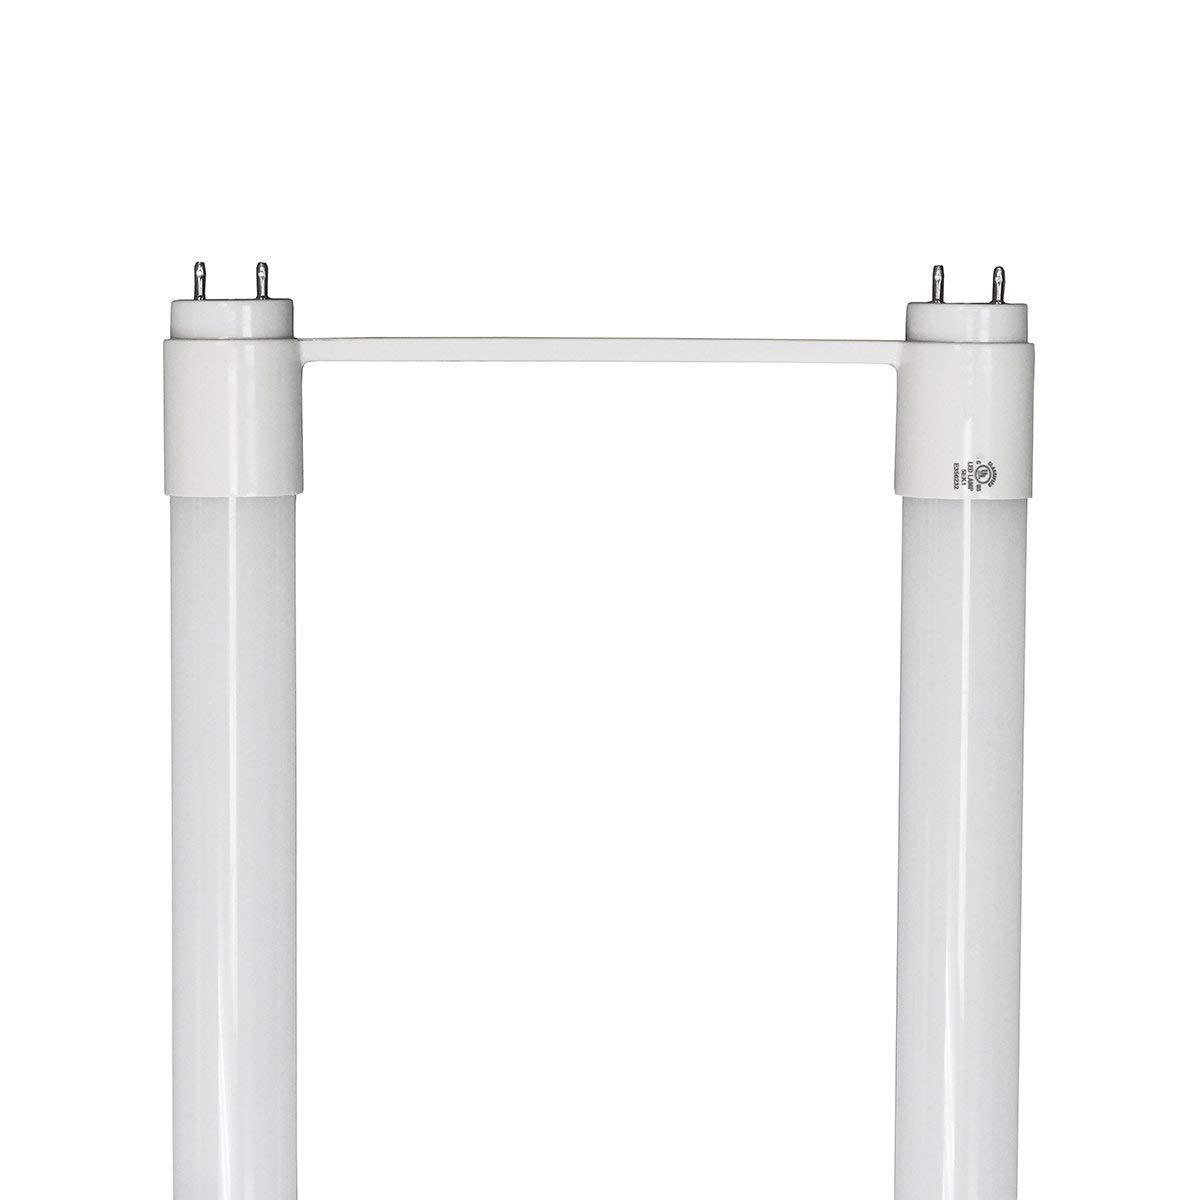 LED-T8U6BYP-5K 5000K Pure-White - Volts: 120V, Watts: 16W, Type: LED T8 U-Bend